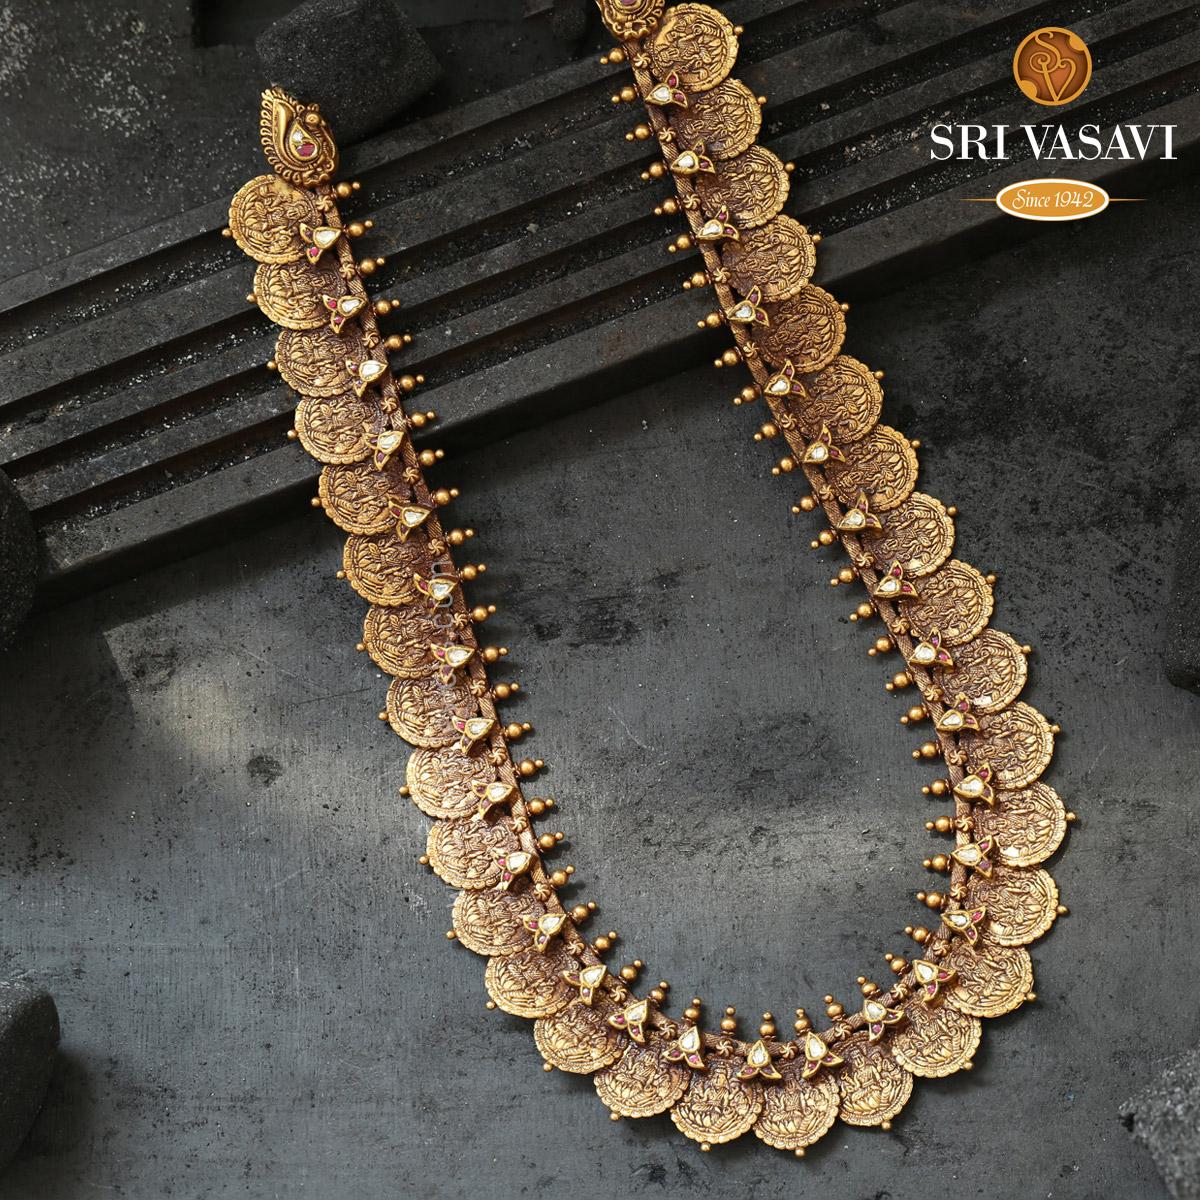 Hiranmayi Kaasu Necklace